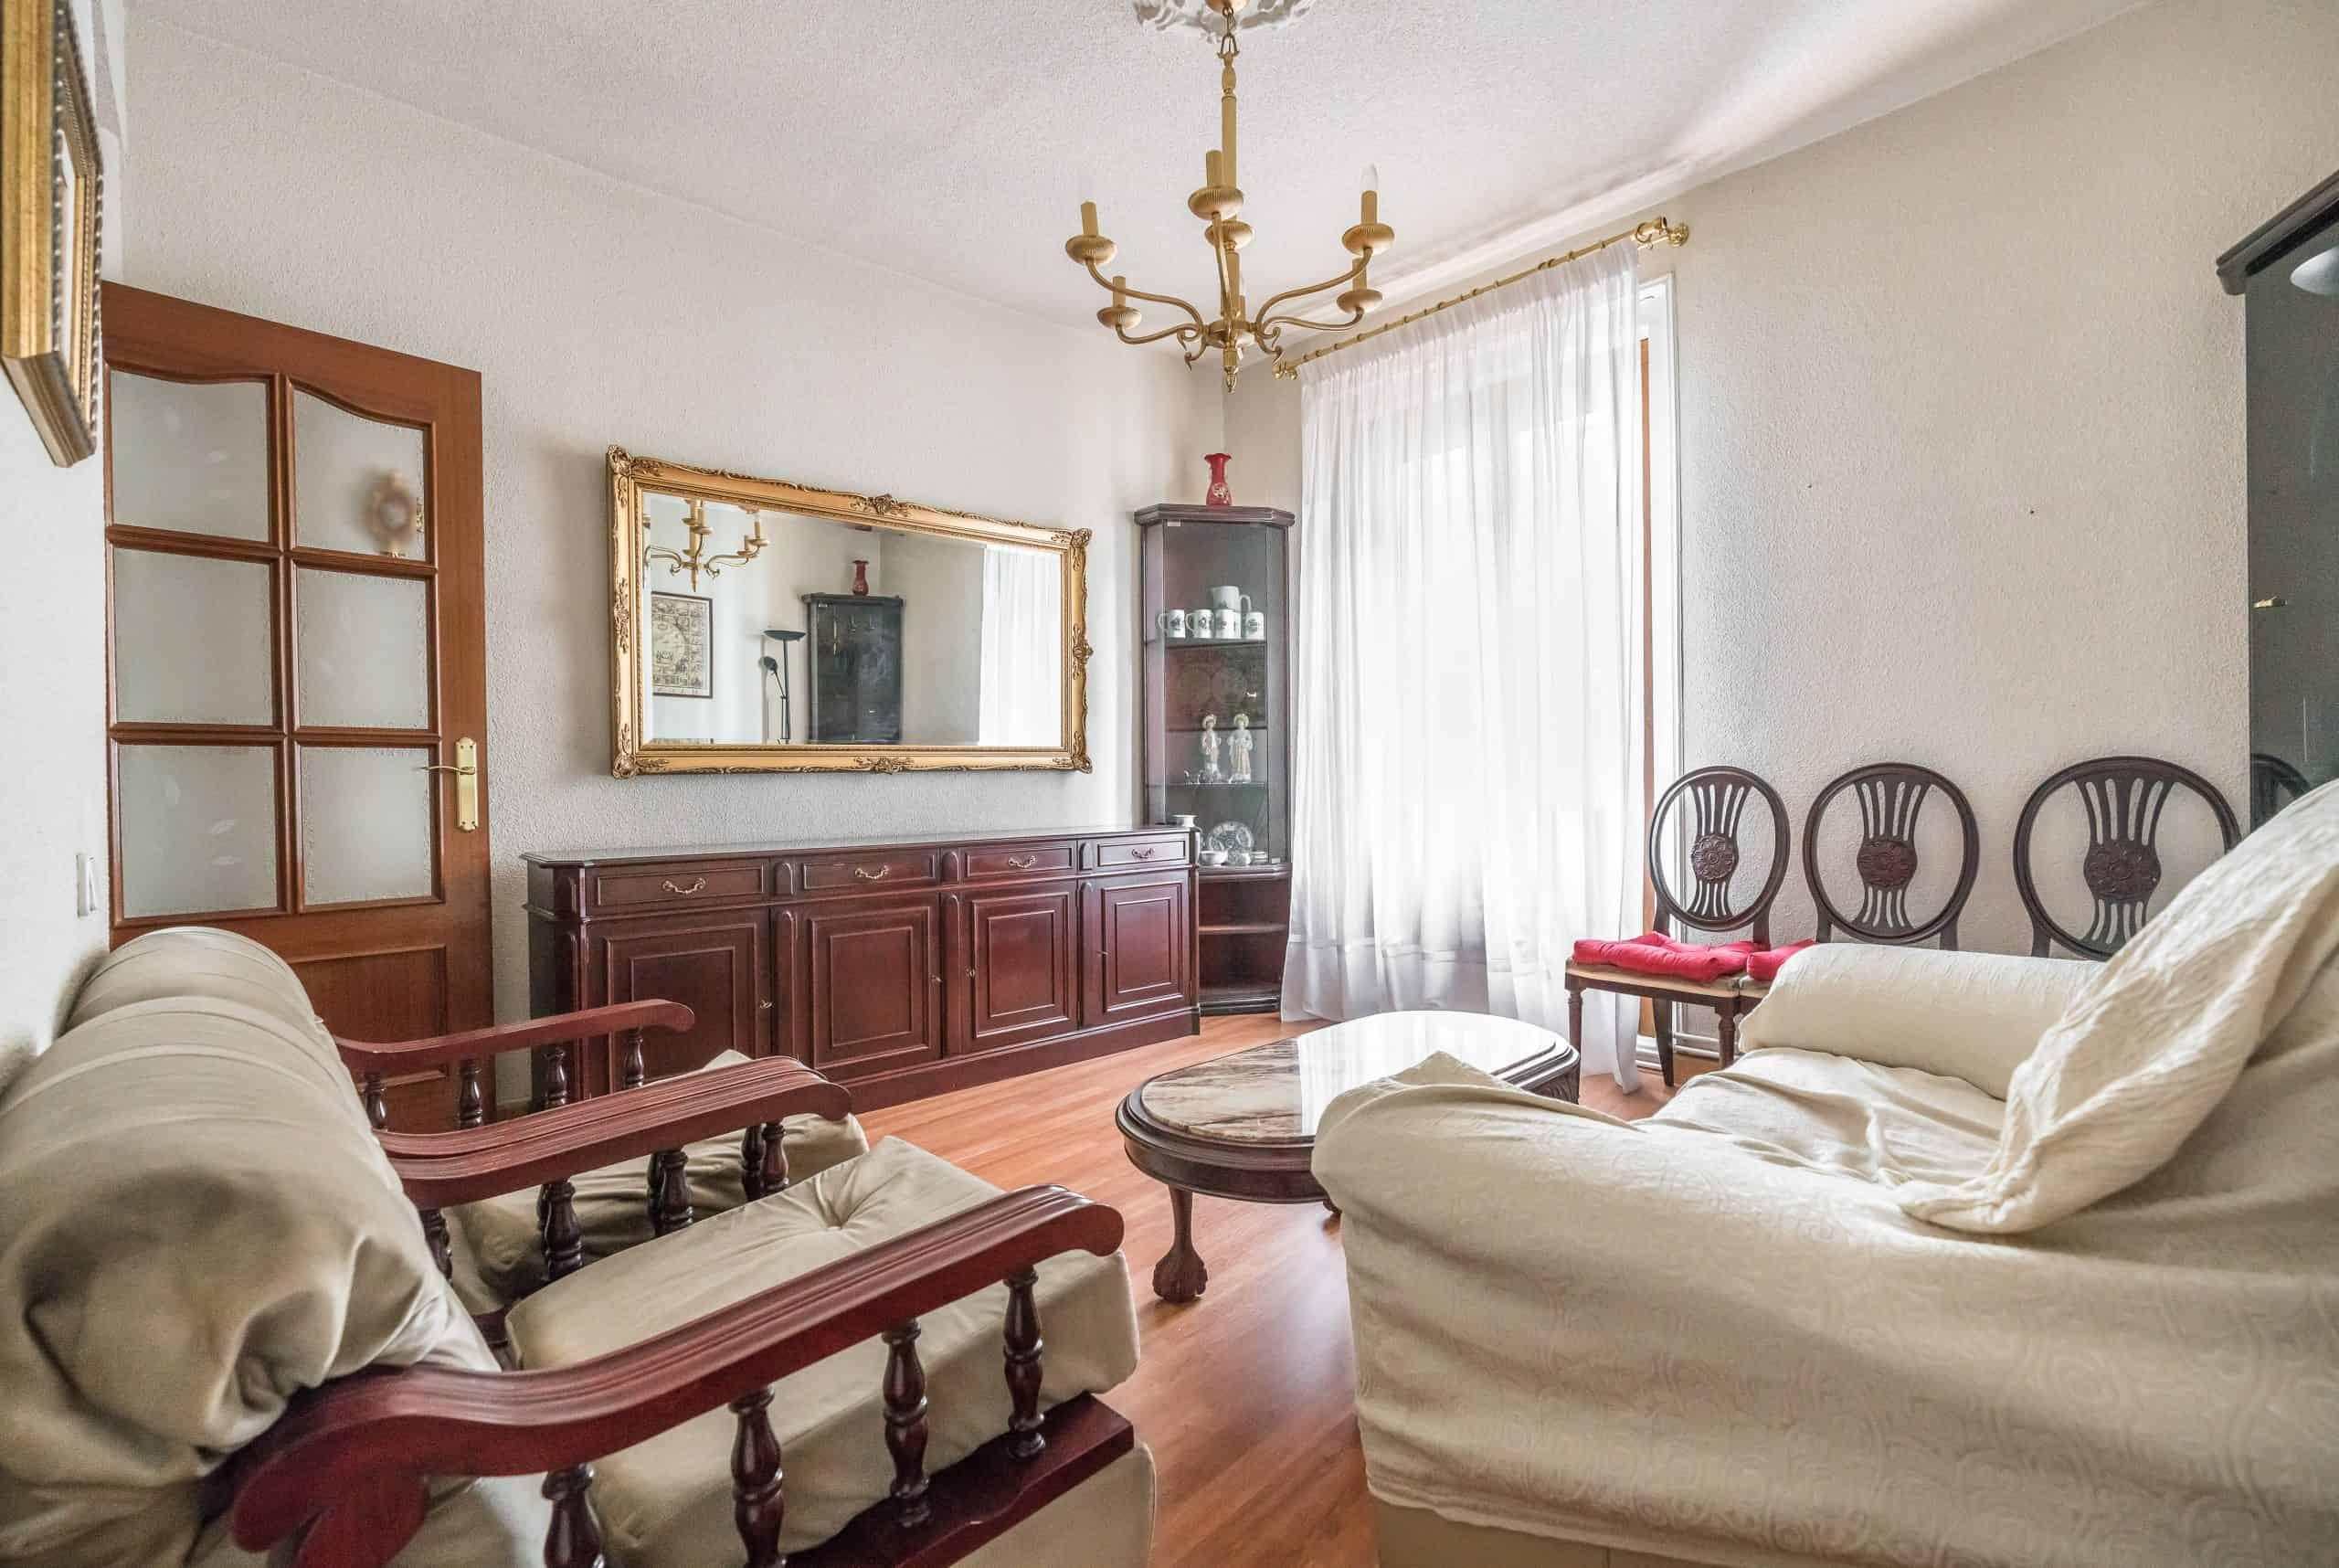 1 SALON (3) (Copy) Agencia Inmobiliaria de Madrid-FUTUROCASA-Zona ARGANZUELA-